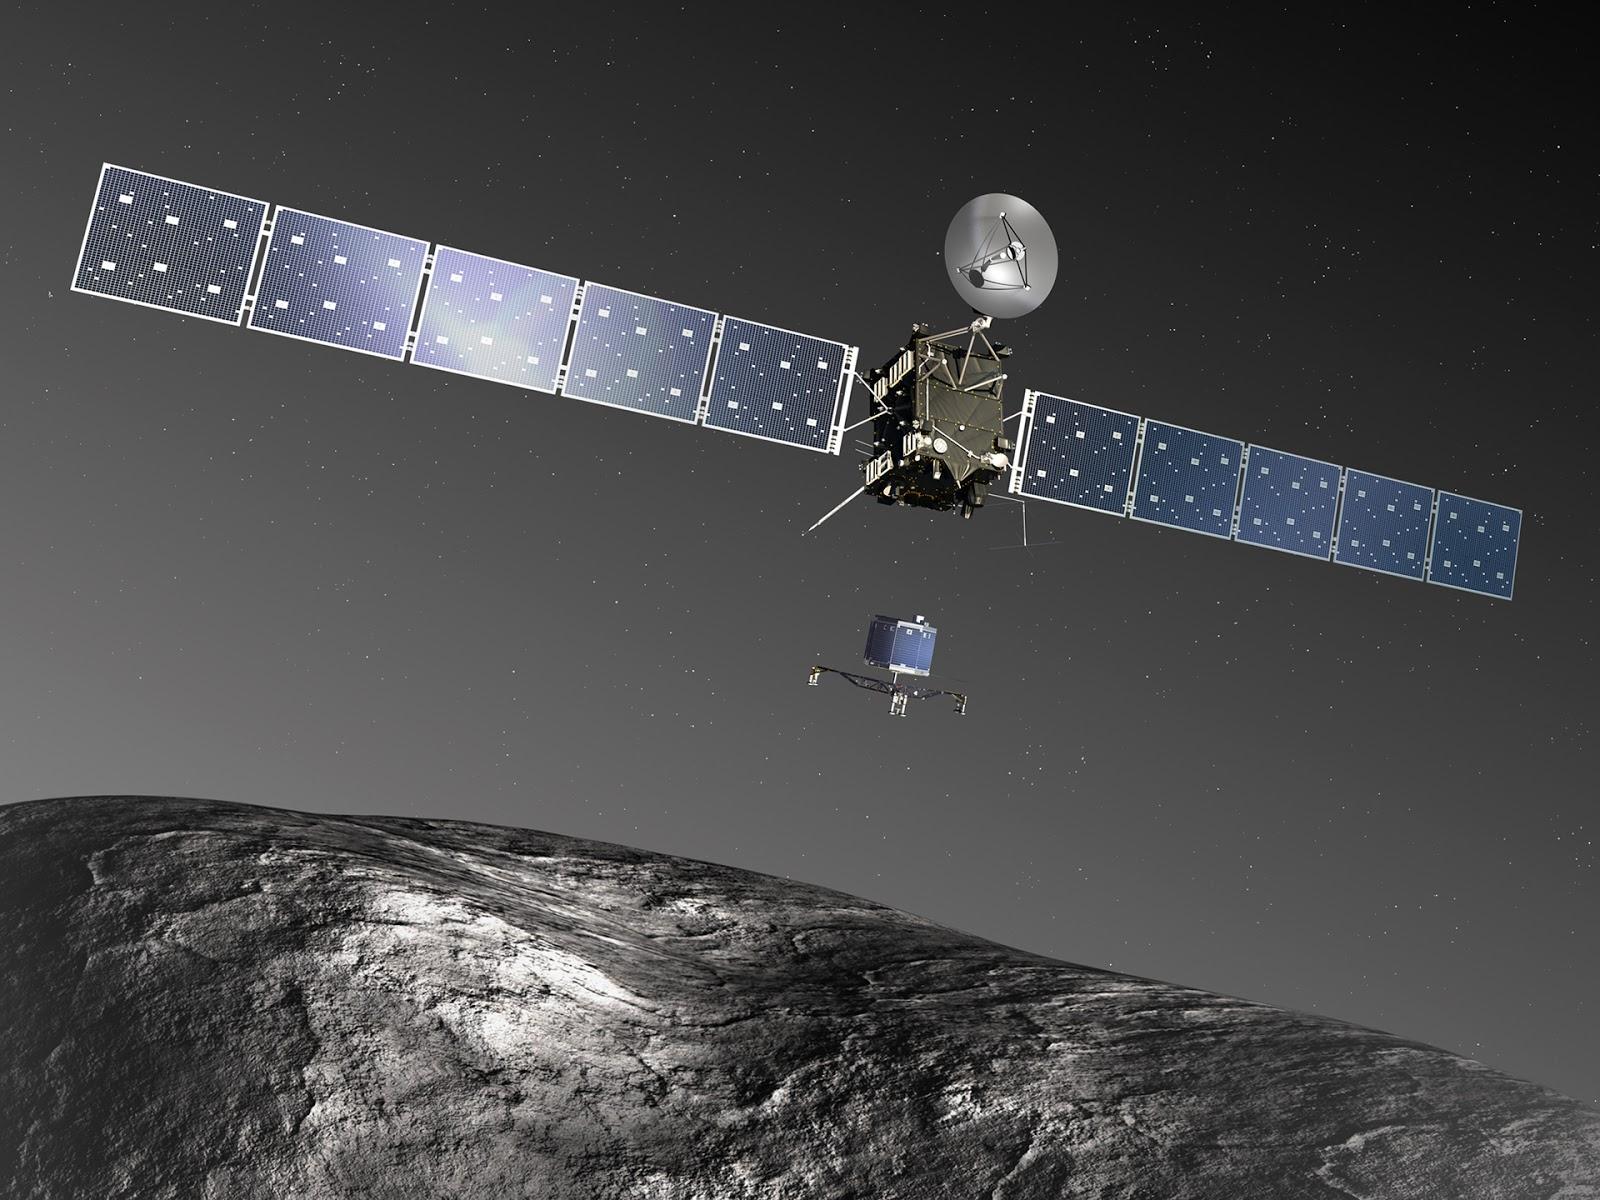 Rosetta svegliati!, Wake Up! Guardiamo insieme la diretta video ESA!